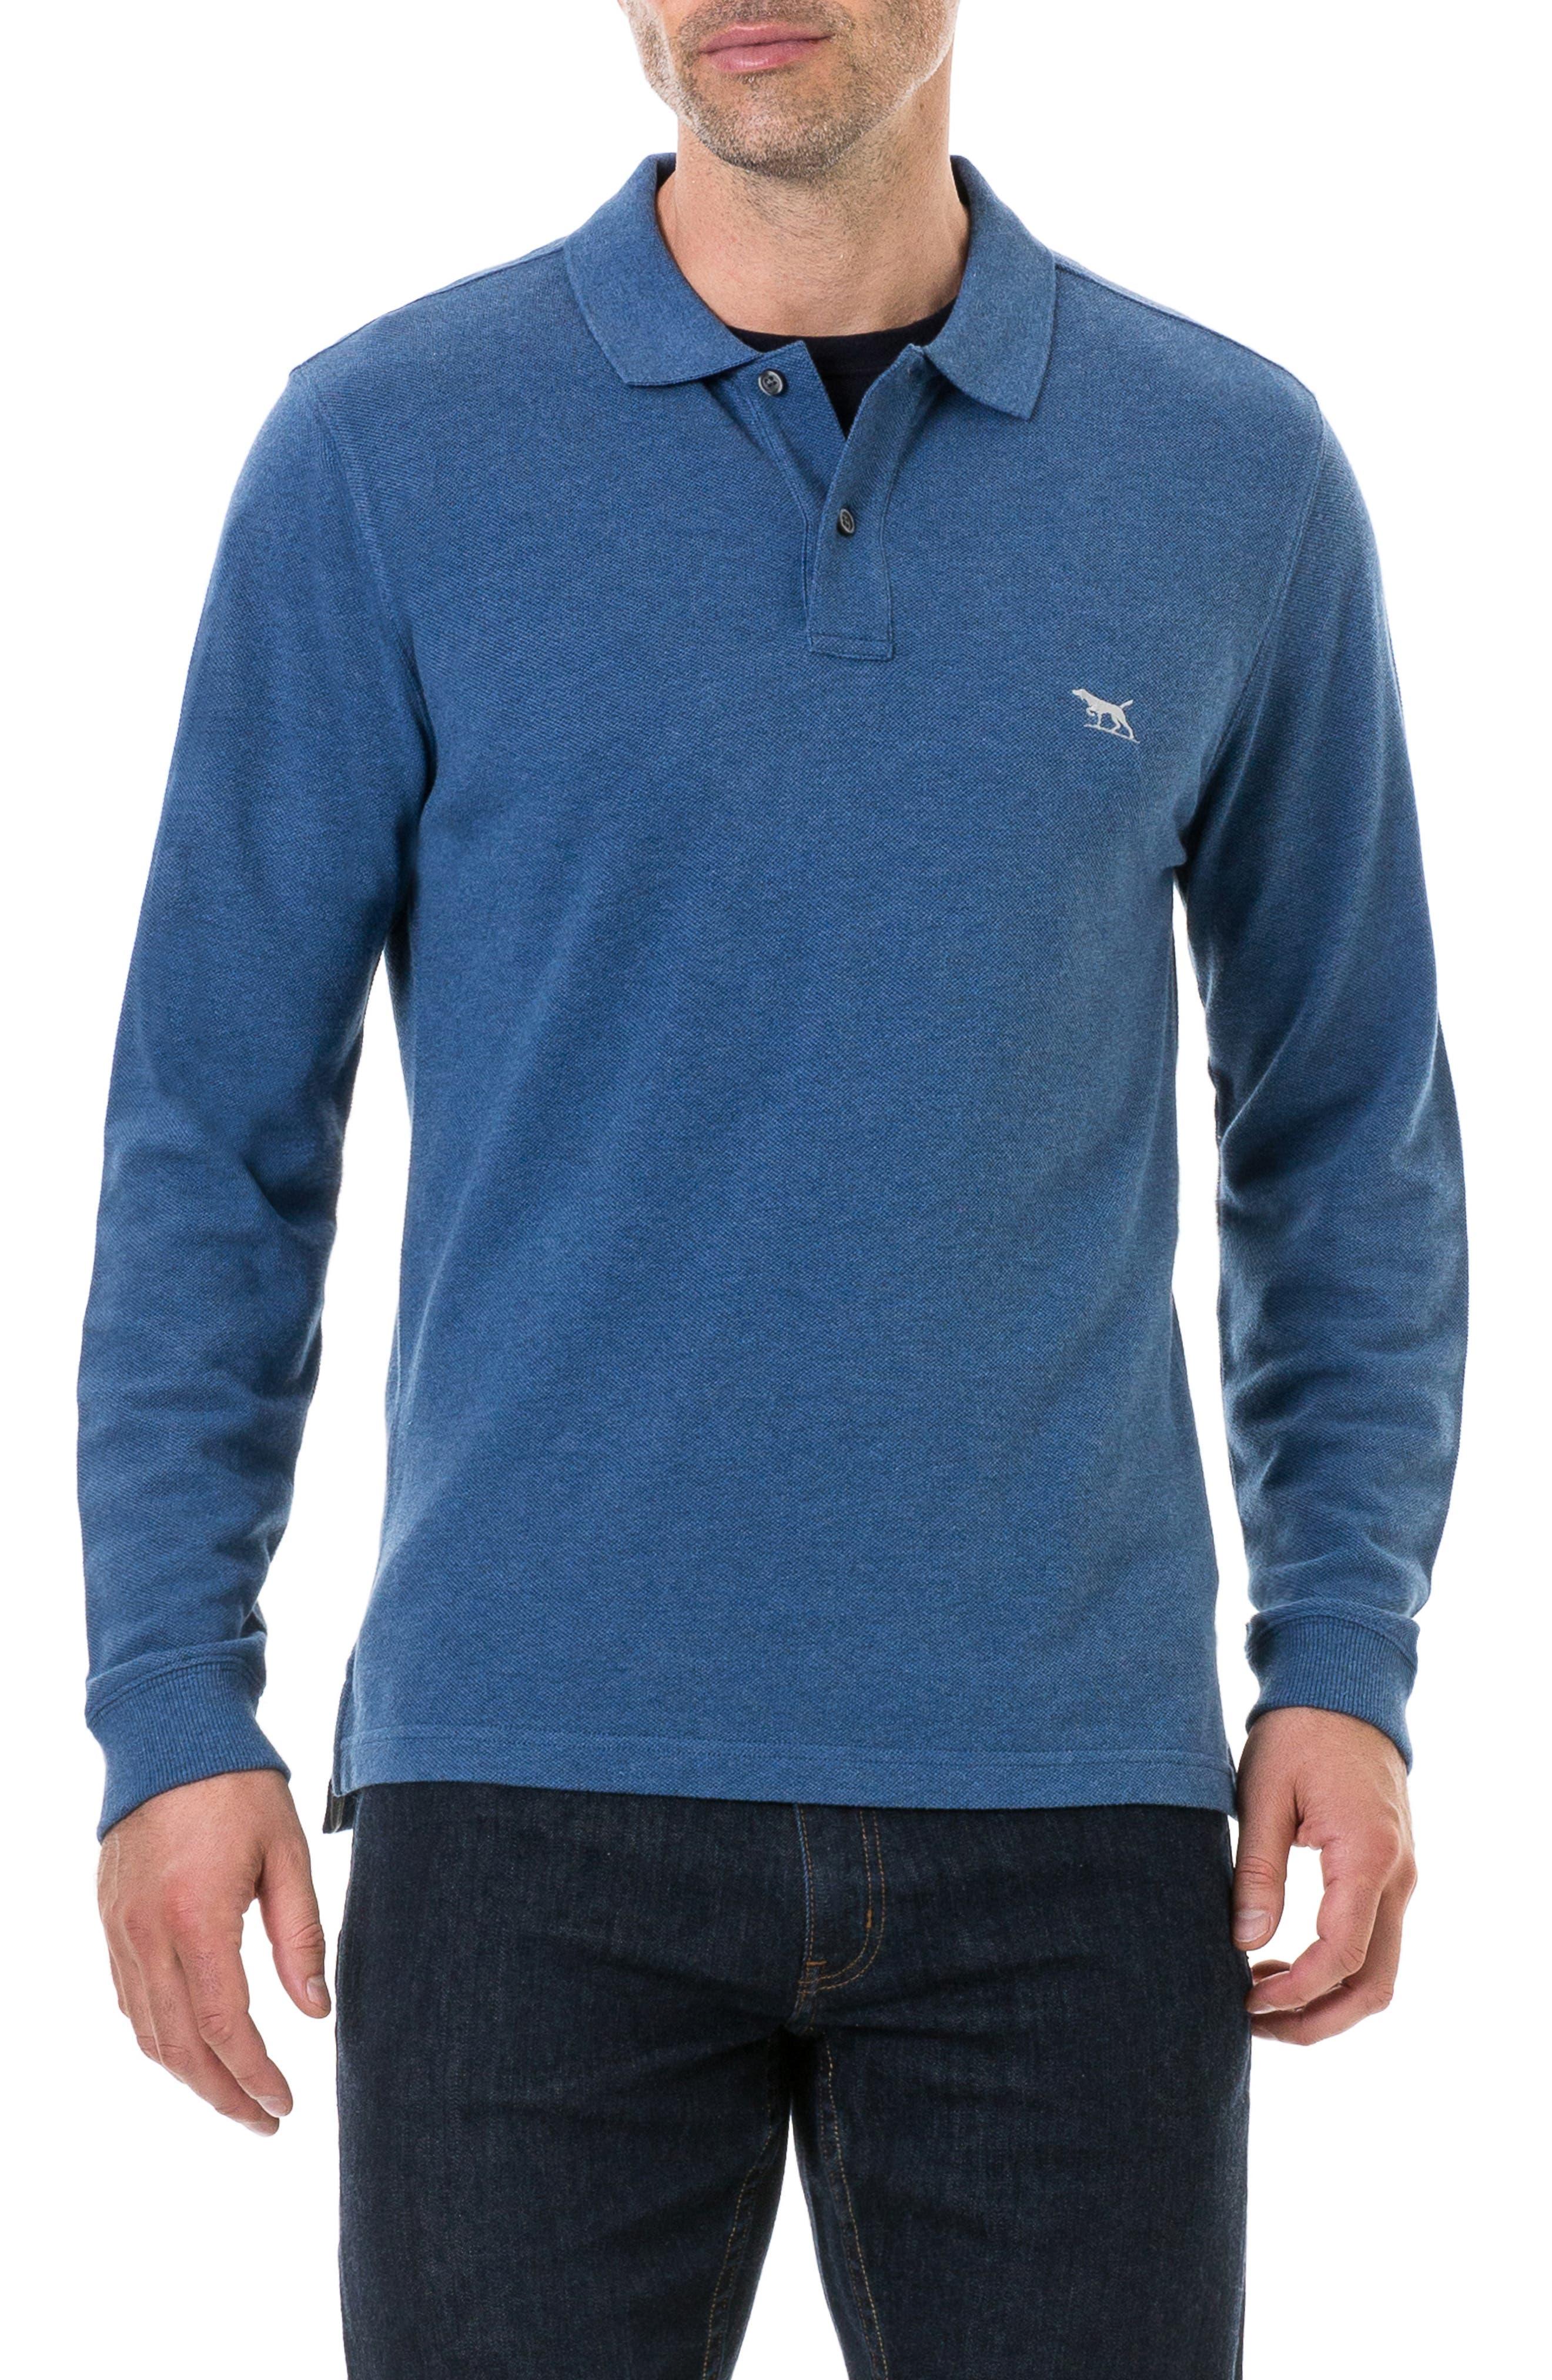 Mens Long Sleeve Polo Shirts Nordstrom